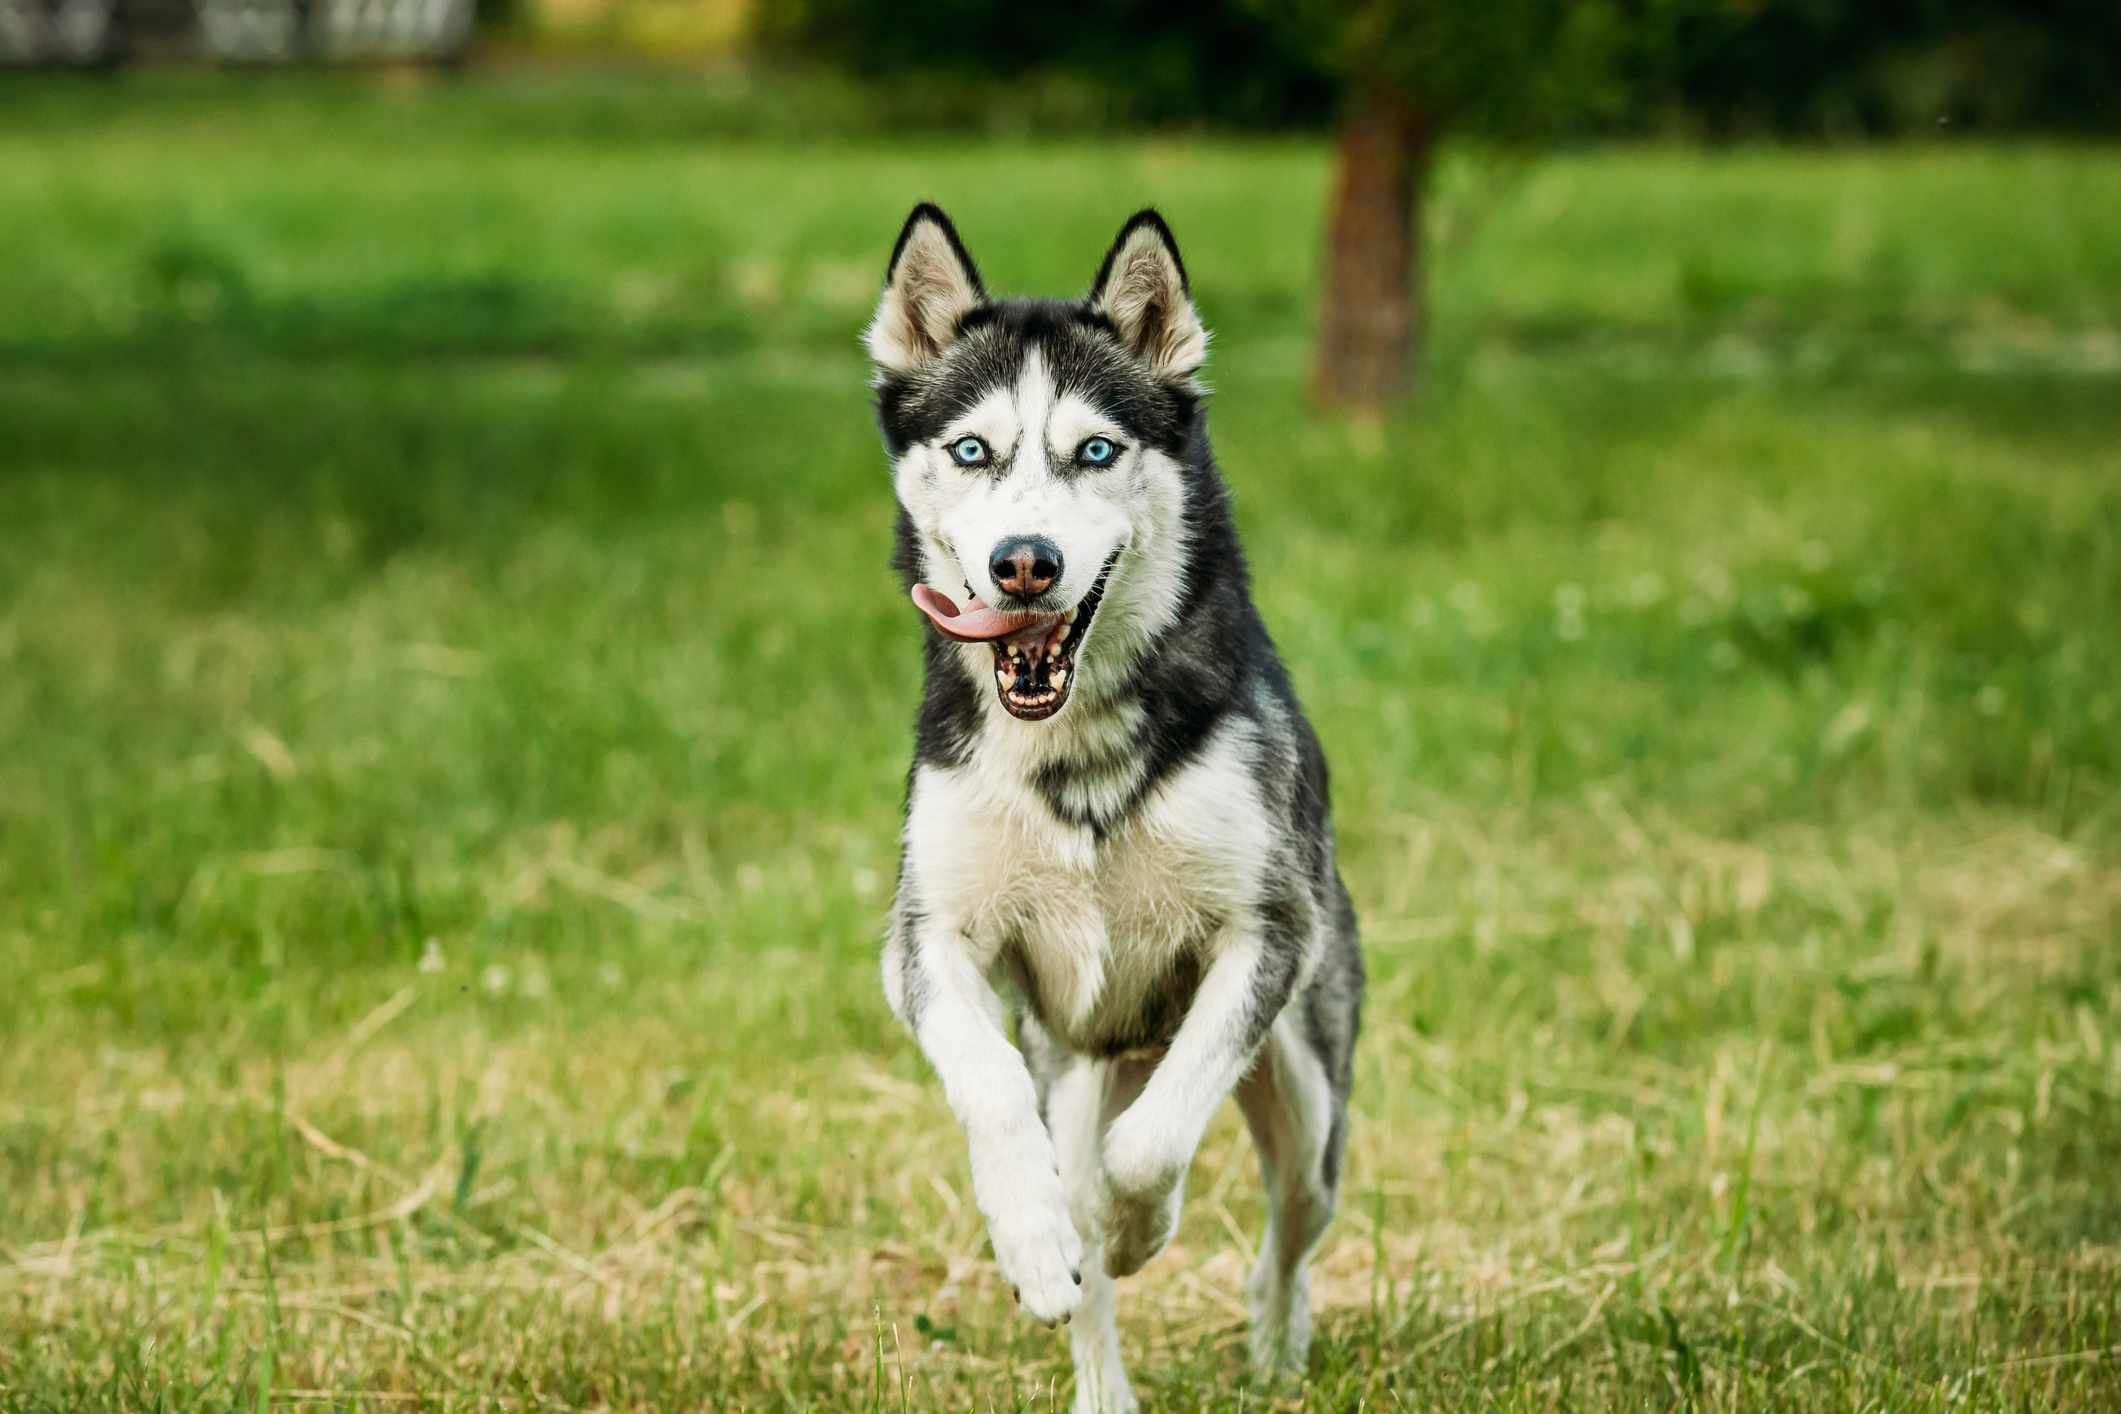 Siberian husky running on grass